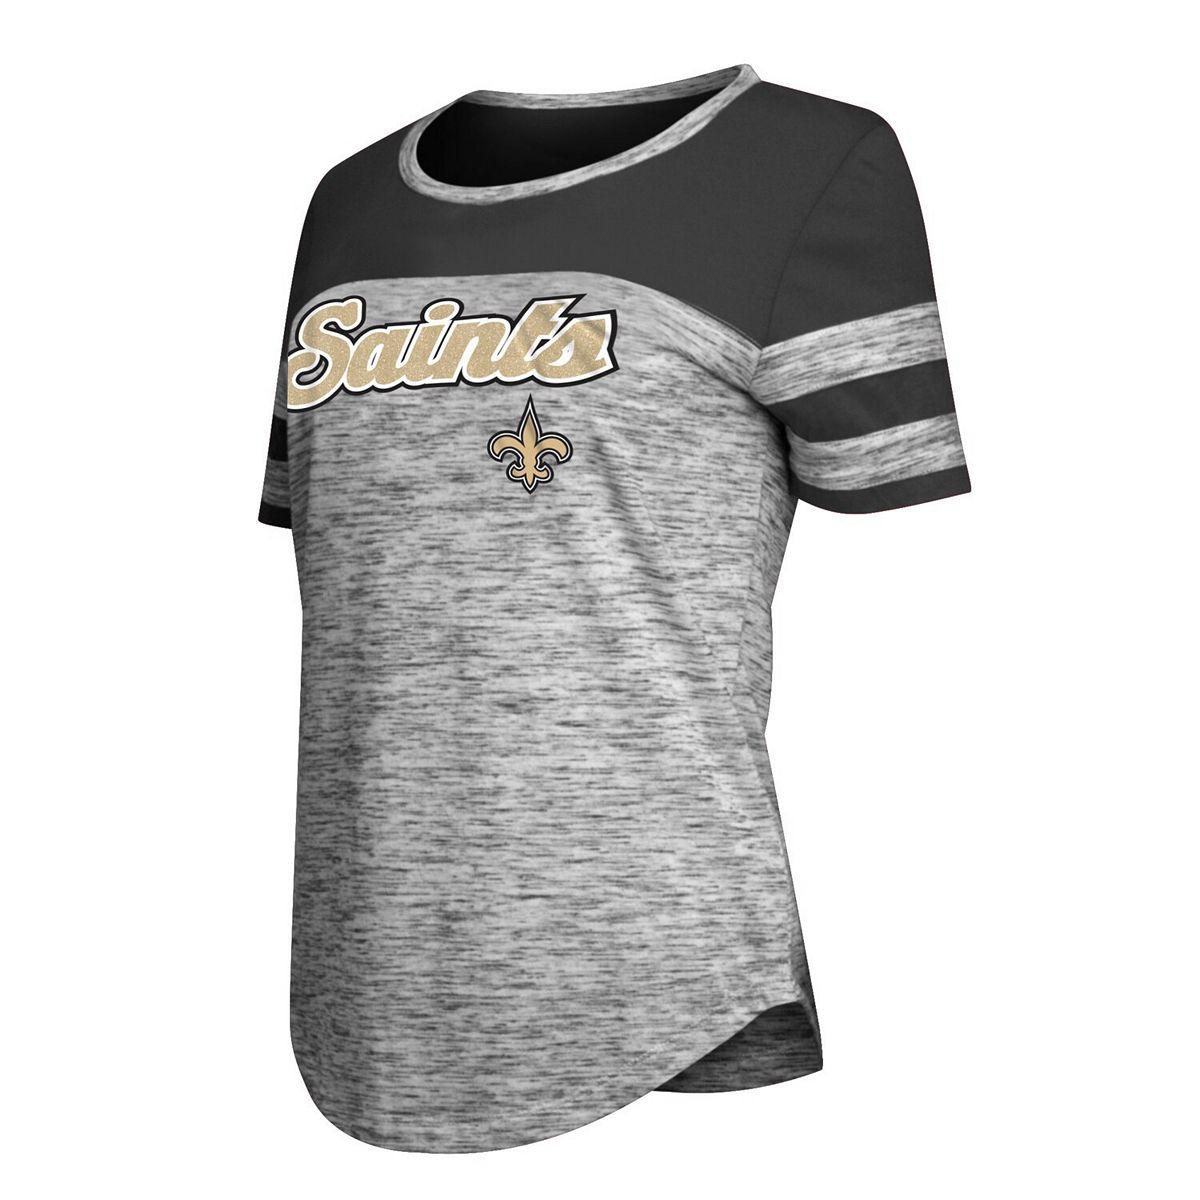 Women's New Era Black New Orleans Saints Glitter Gel T-Shirt pCTvK